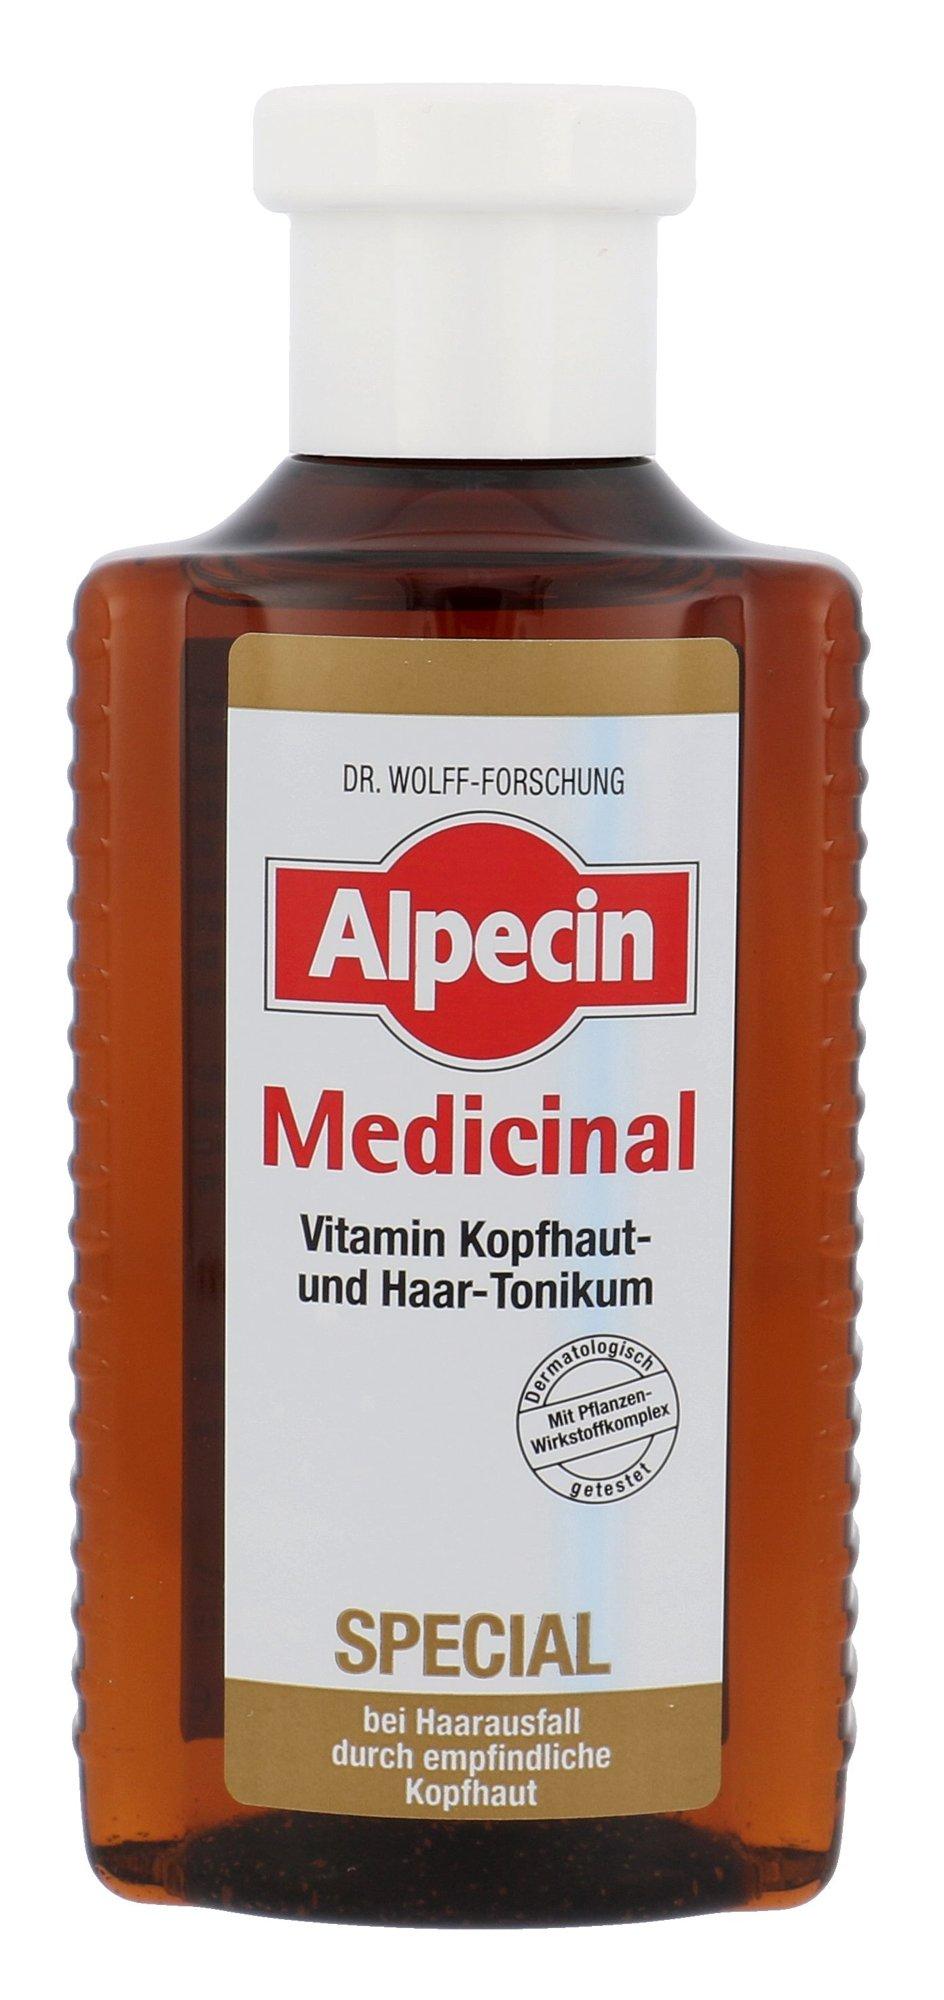 Alpecin Medicinal Special Cosmetic 200ml